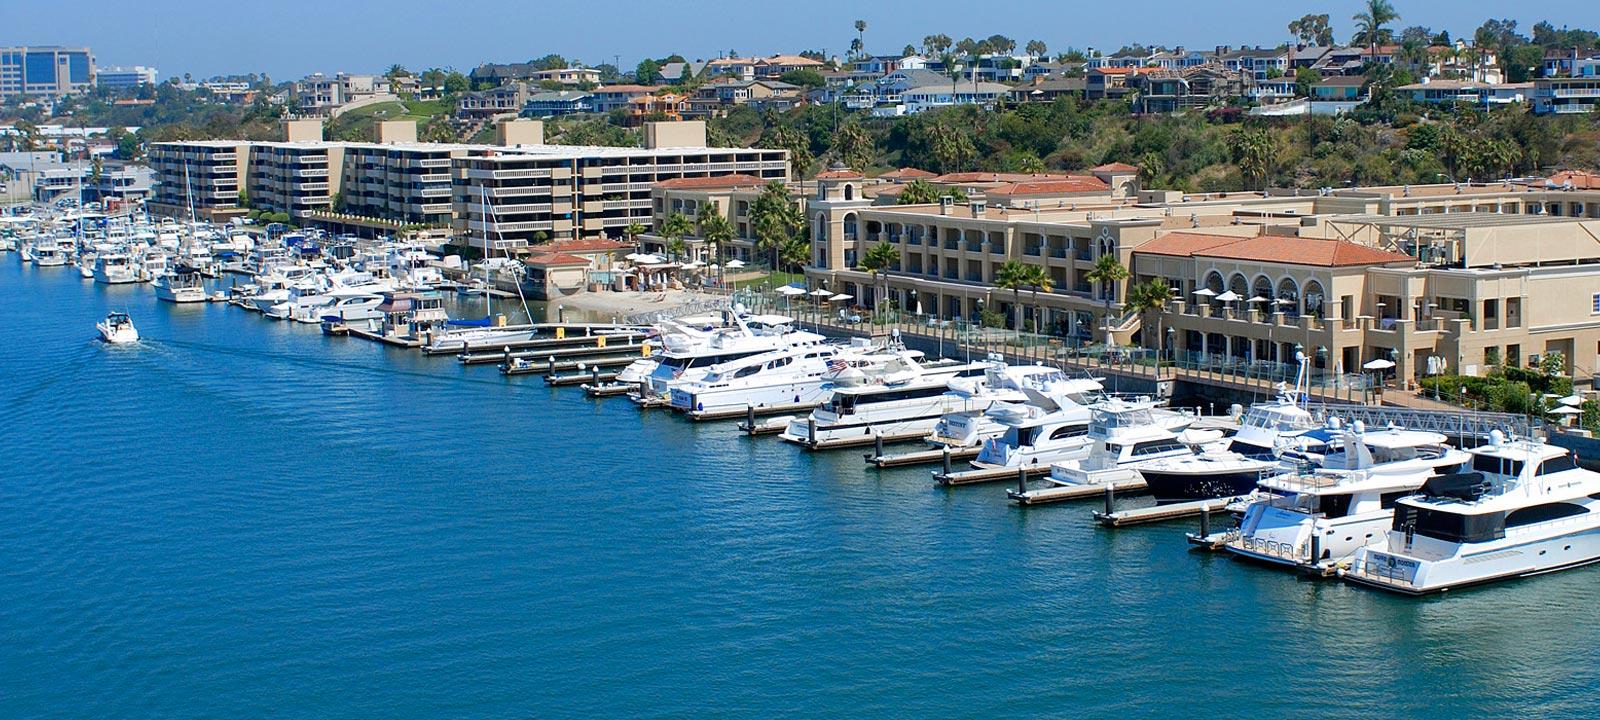 Harbour Island Dr Newport Beach